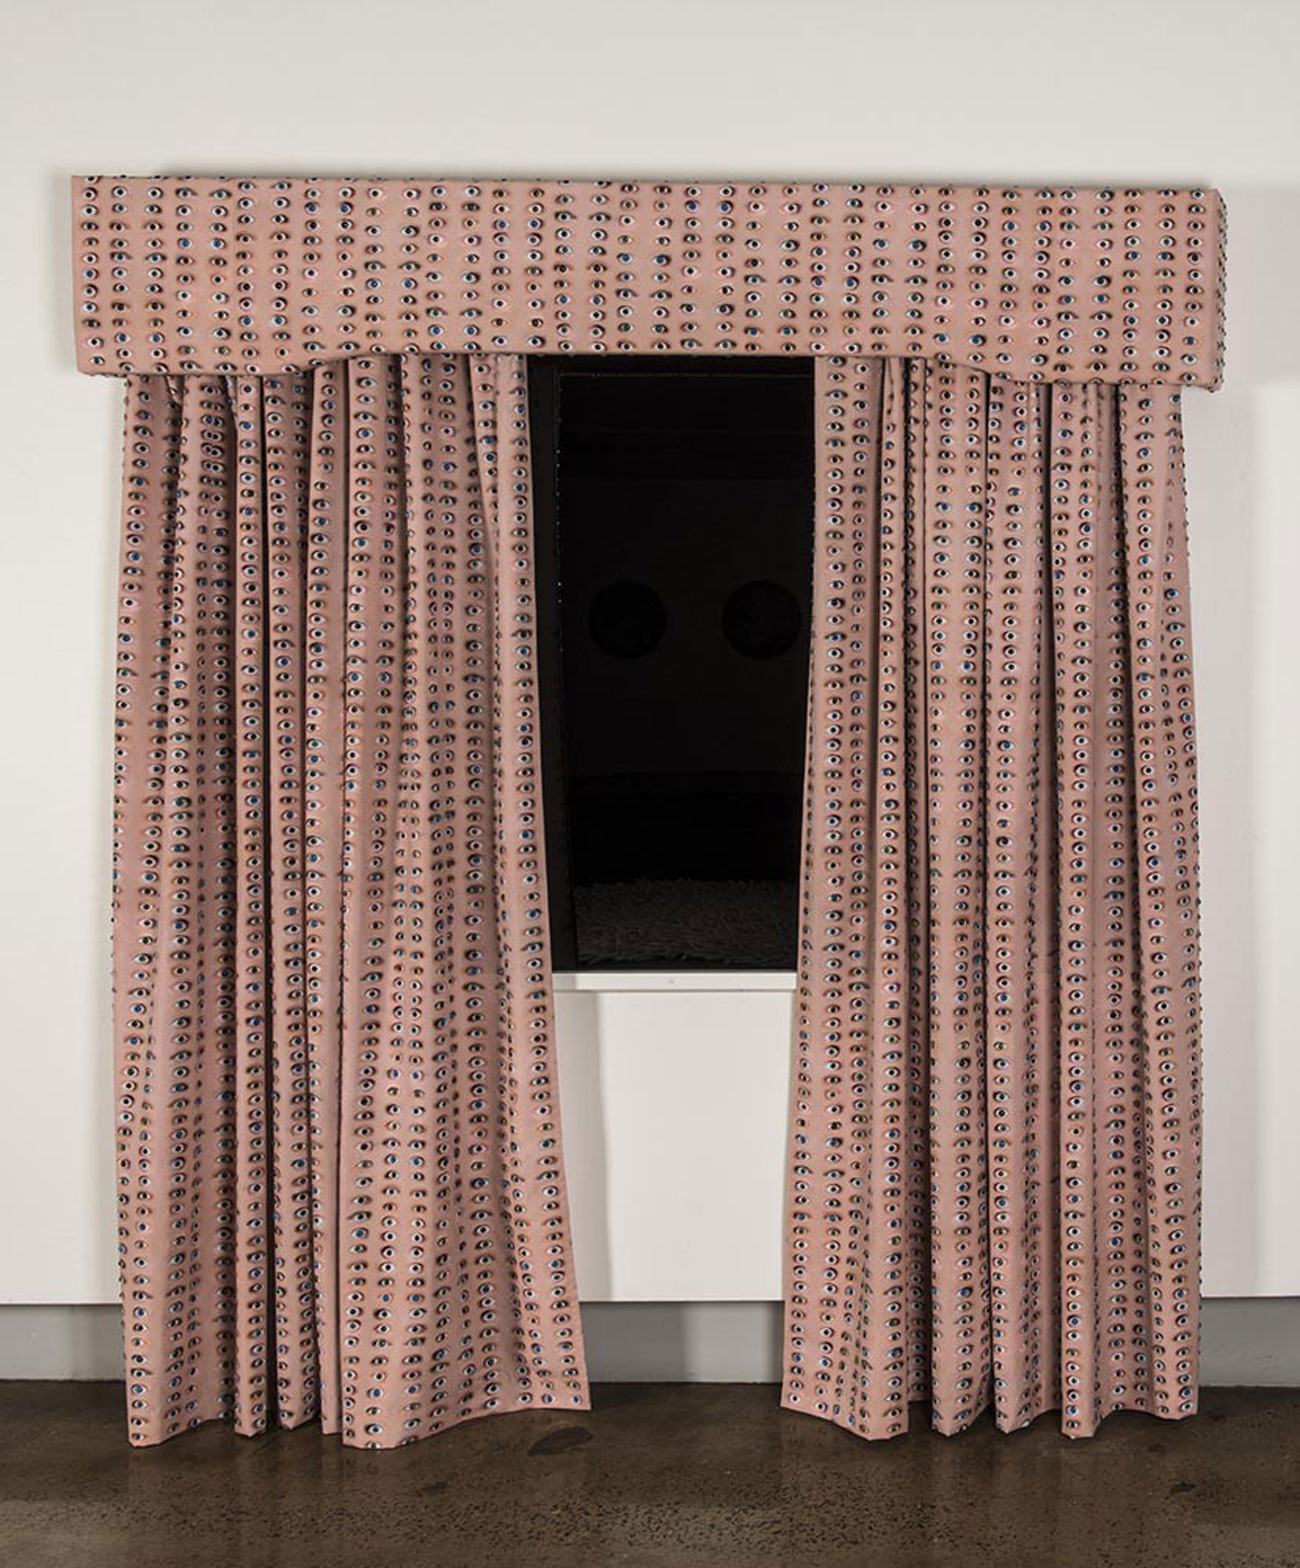 fiona roberts the dark window